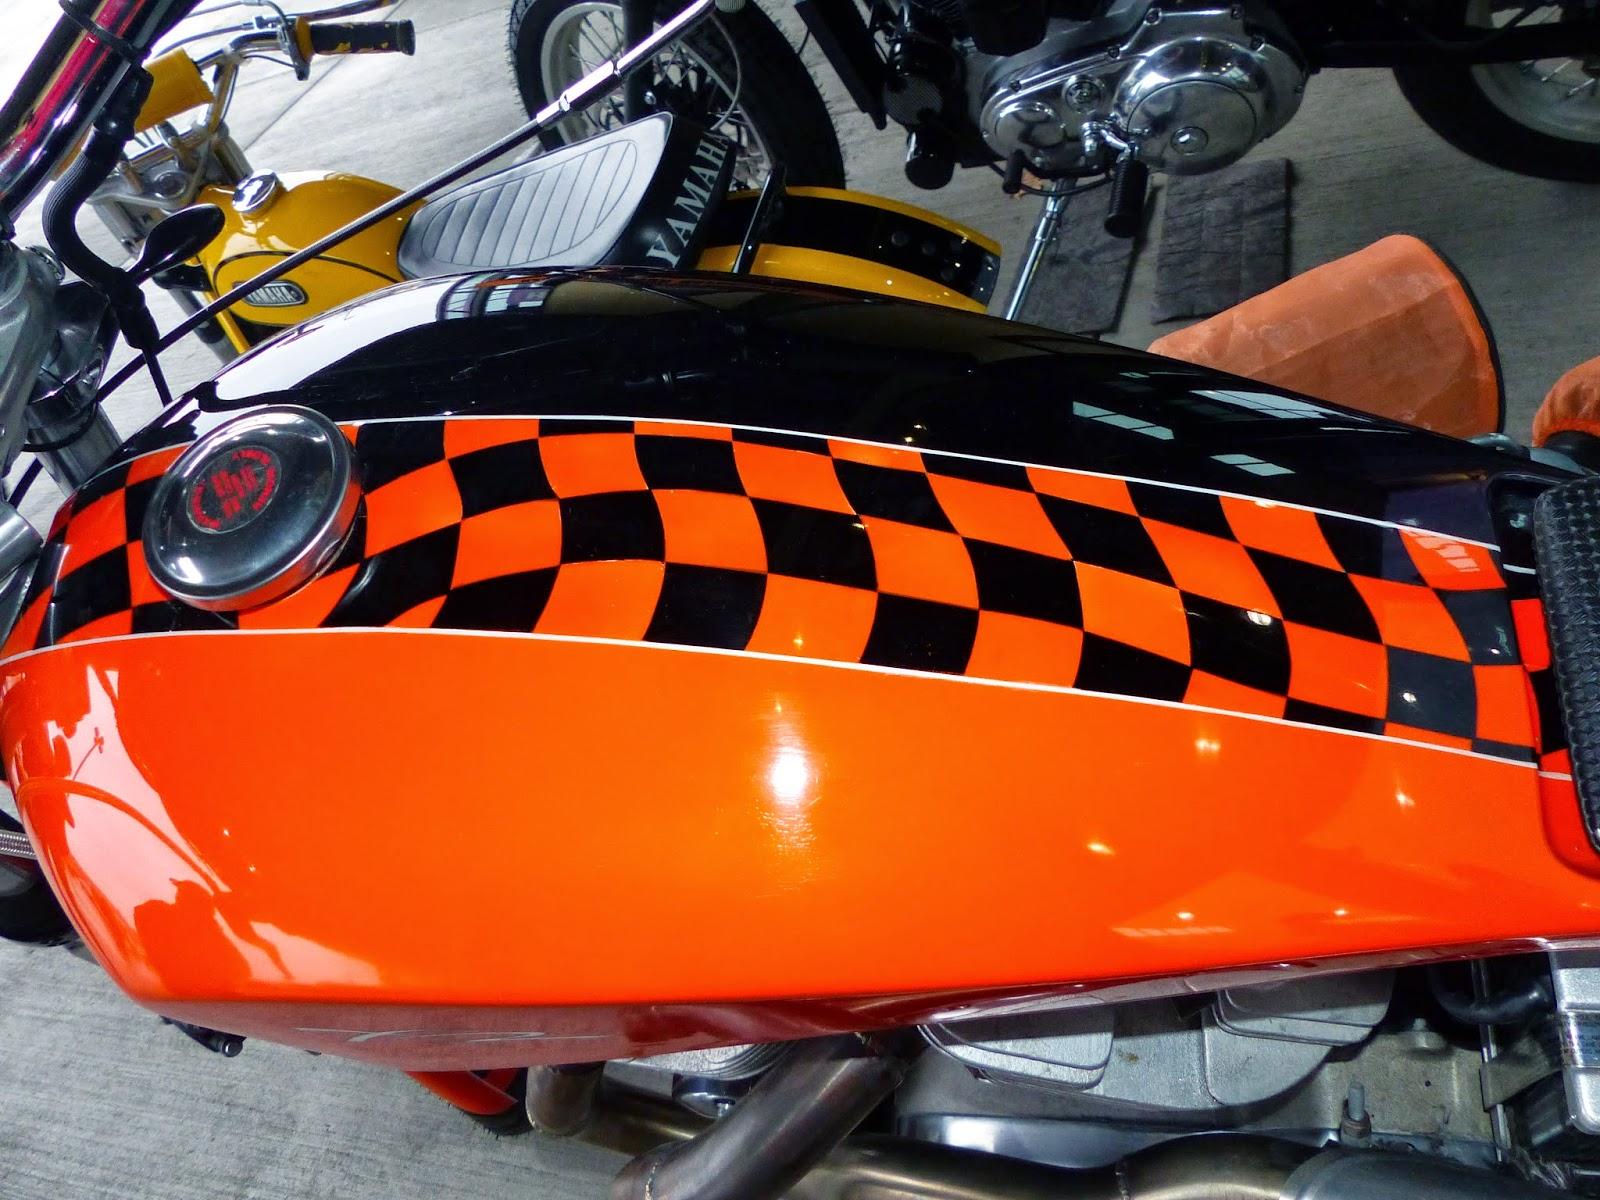 1970 Harley Davidson Evel Knievel Tribute: OldMotoDude: Harley Davidson XR Street Tracker Spotted In